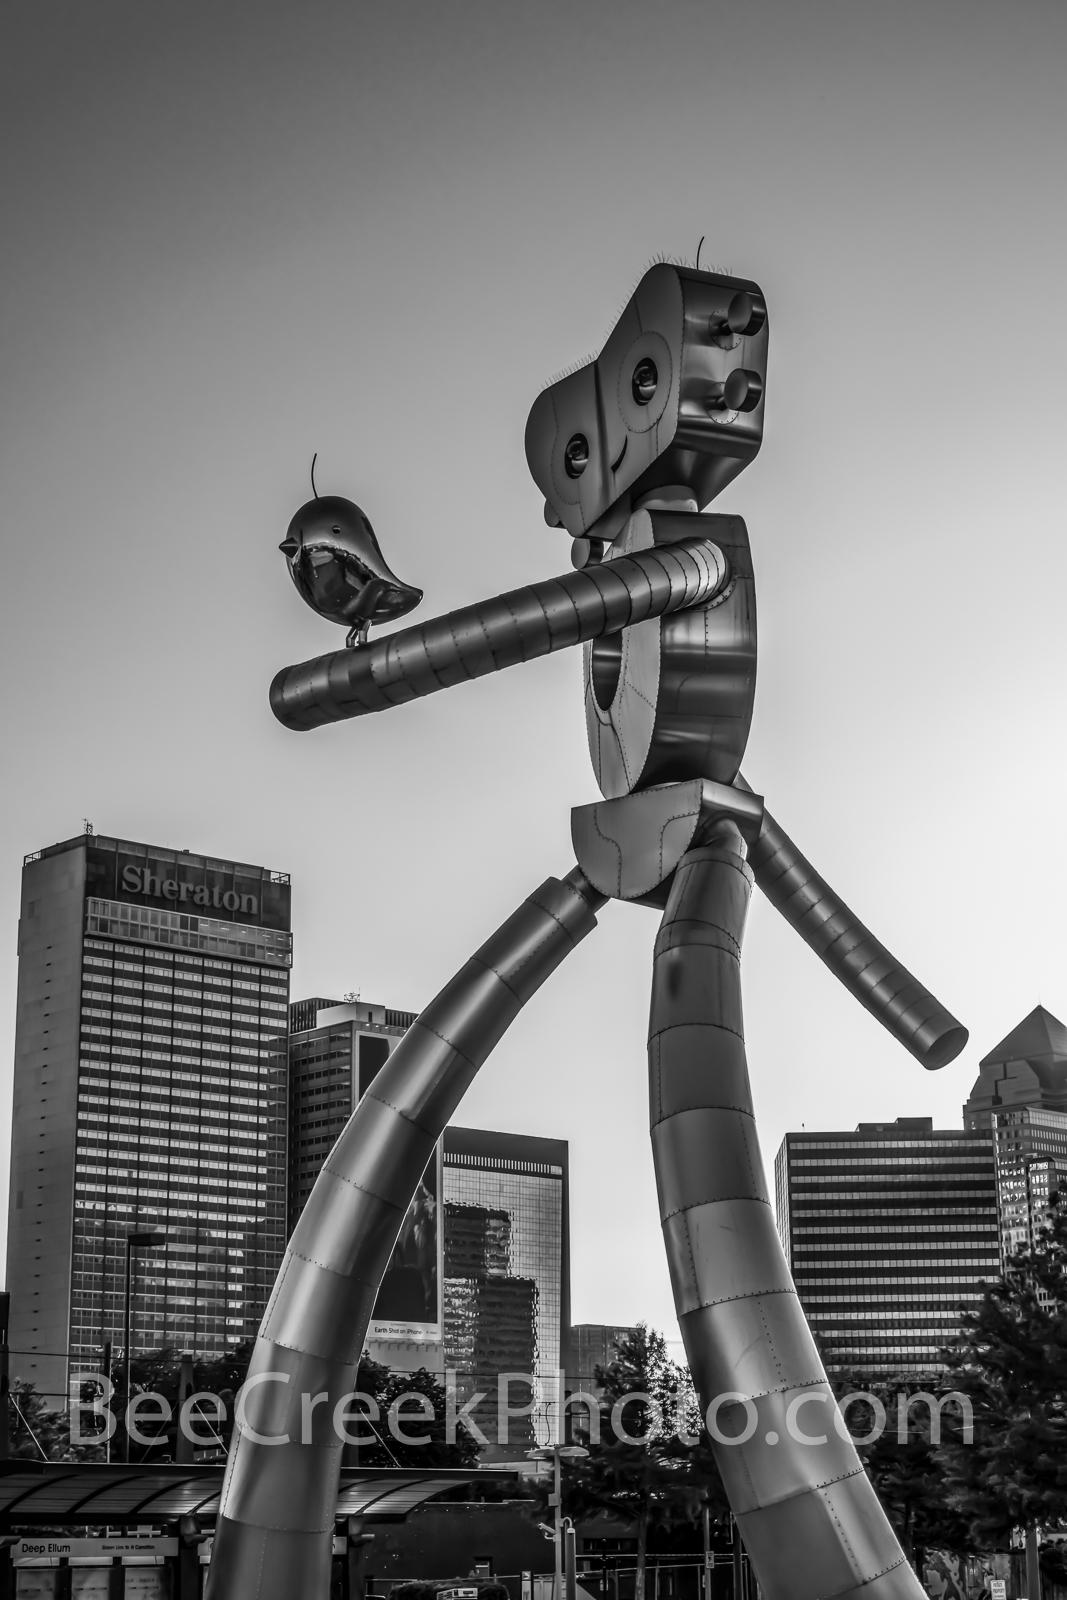 Dallas, traveling man, vertical,  dallas skyline,  Deep Ellum, mass transit, scuplture, robot, stainless steel, rivets, guitar, music, strolling, pictures of dallas,  Dallas skyline,  east dallas, dus, photo